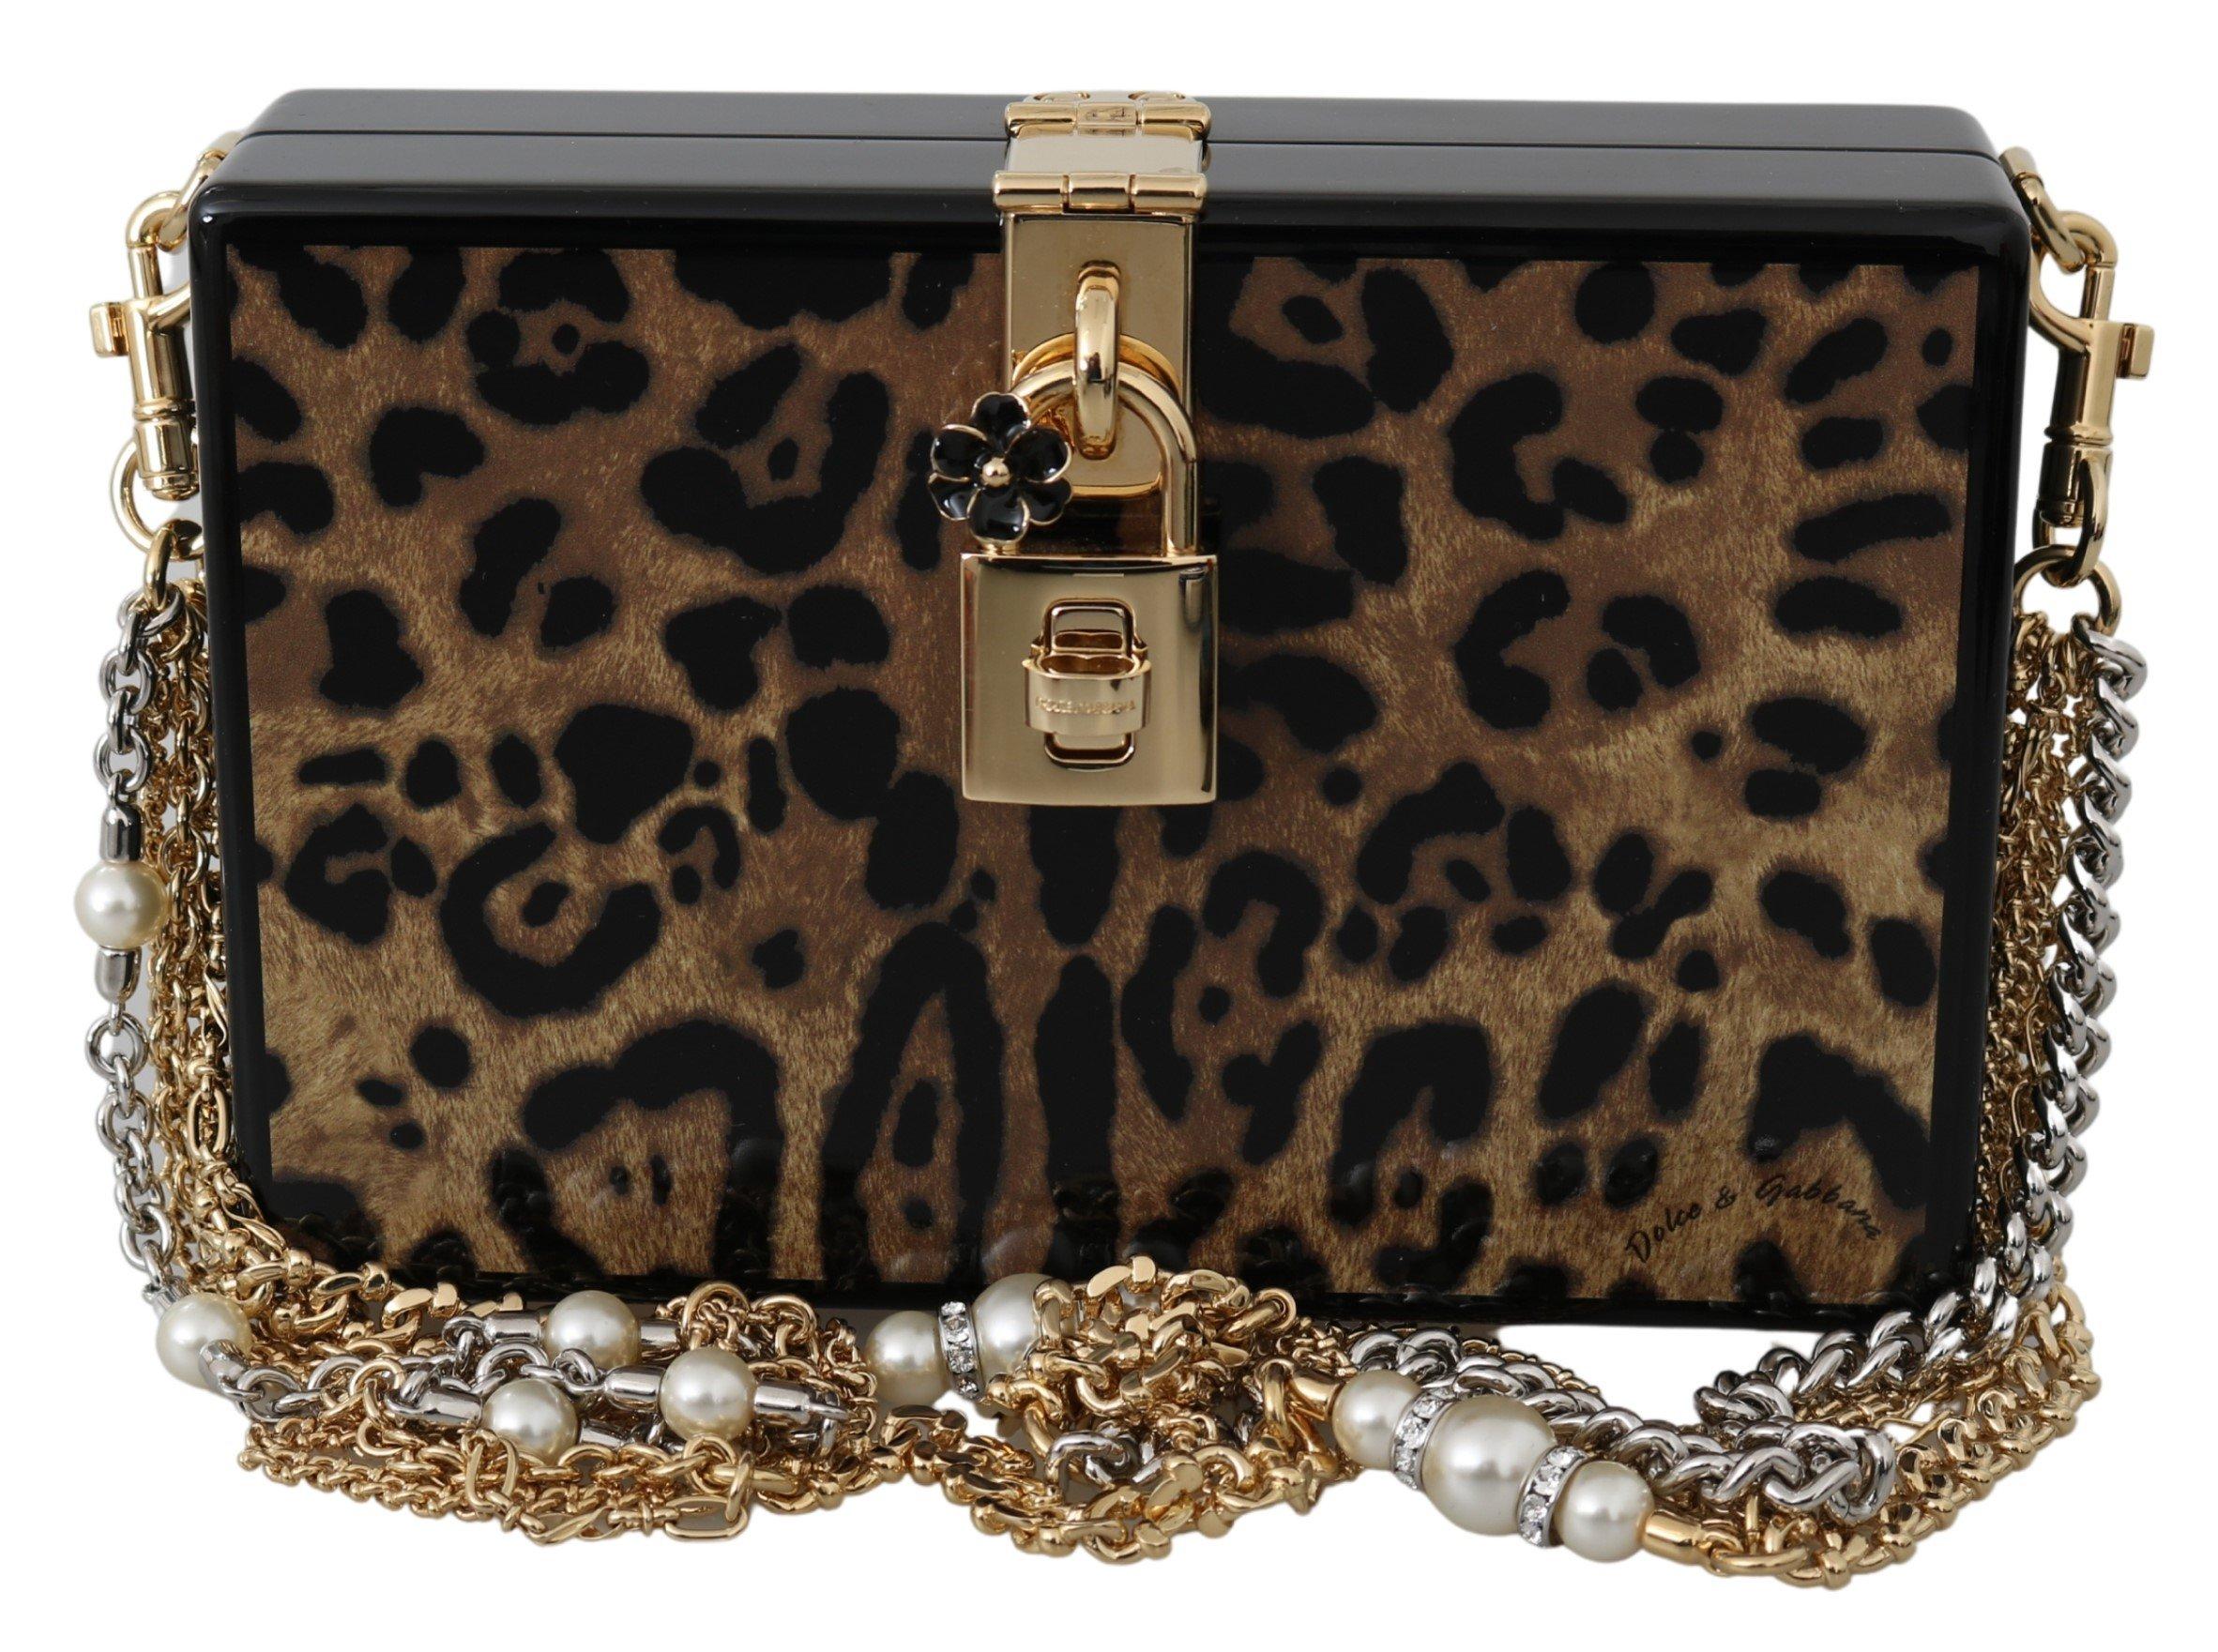 Dolce & Gabbana Women's BOX Wood Shoulder Bag Brown VAS9722